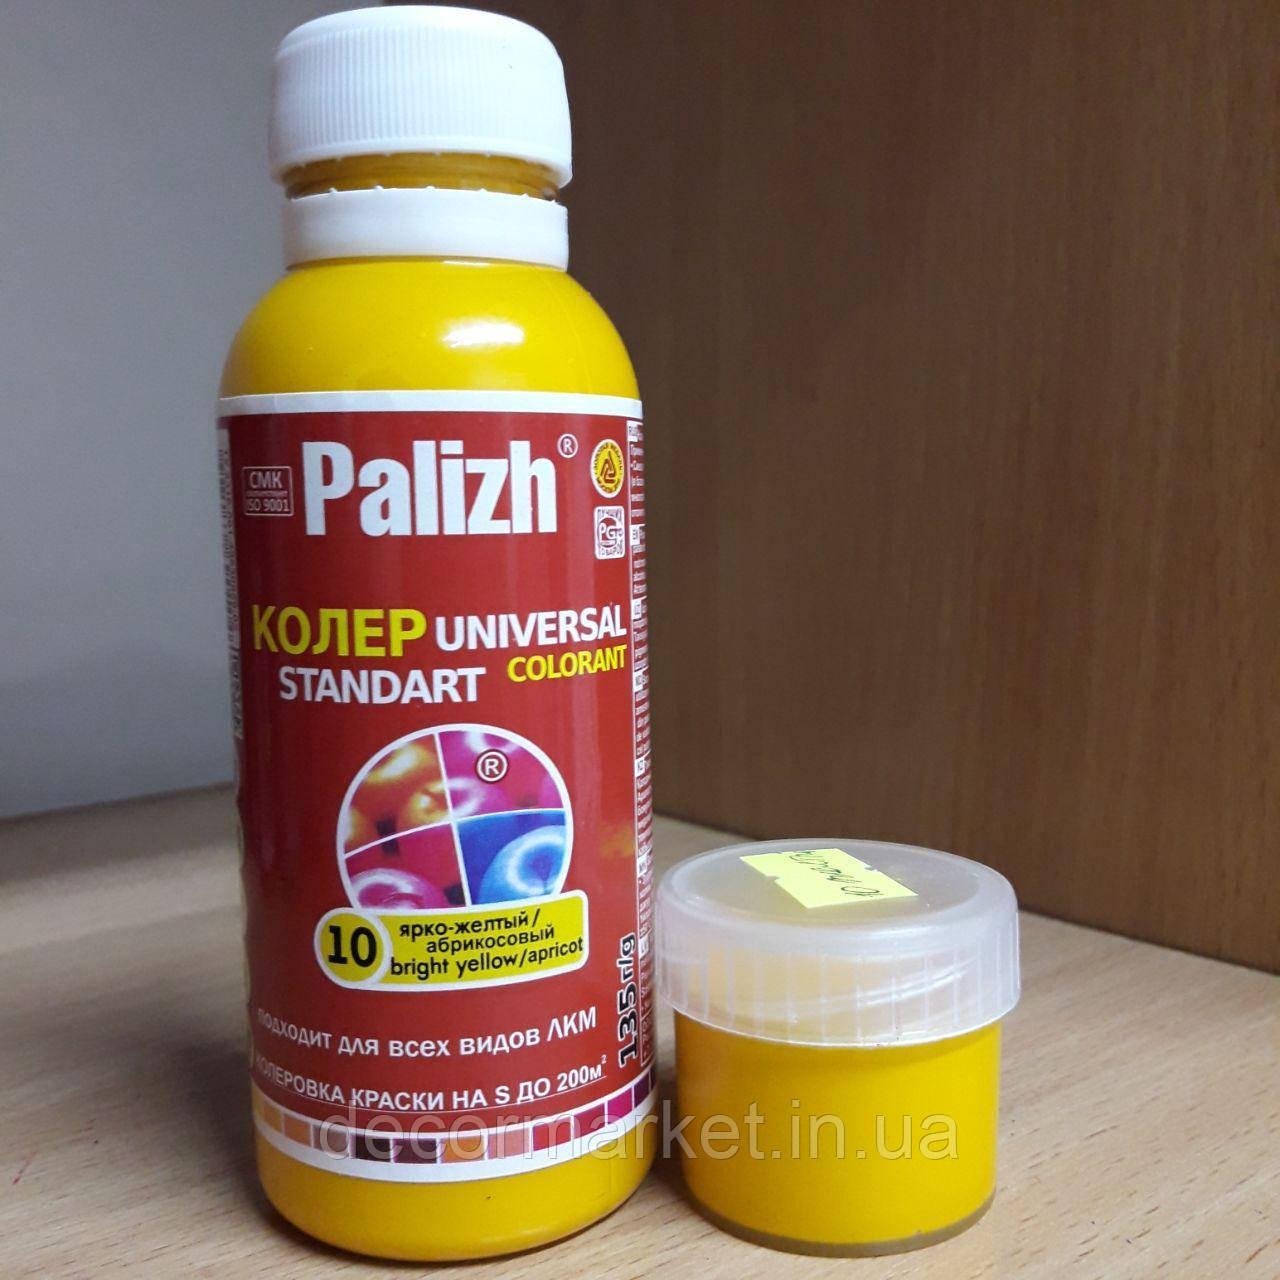 Колер PALIGH ярко-желтый 140мл